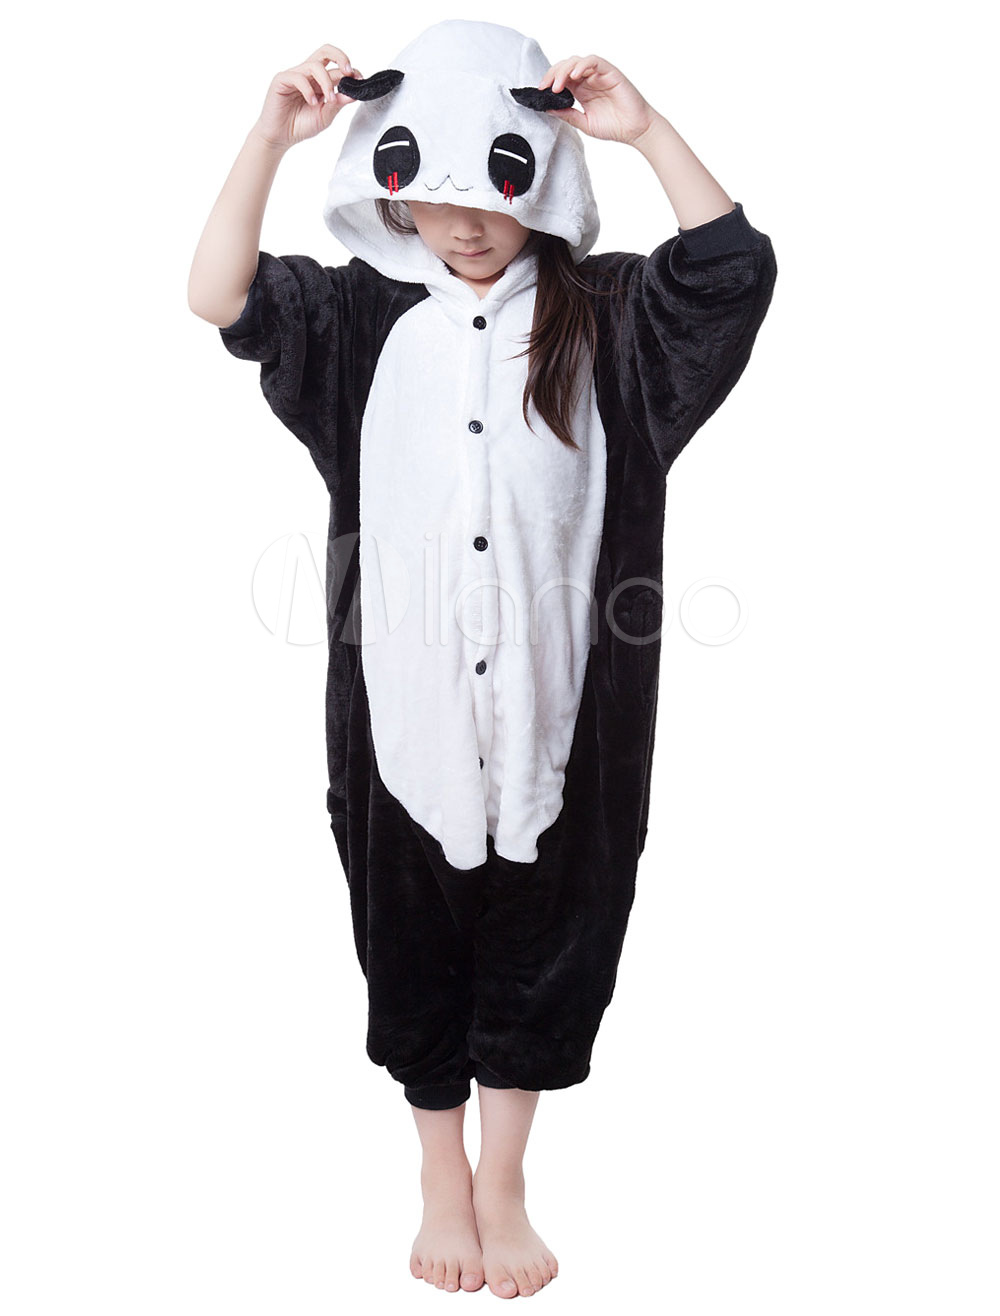 Buy Kigurumi Pajama Panda Onesie For Kids Black&White Synthetic Jumpsuit Christmas Mascot Costume Halloween for $18.89 in Milanoo store